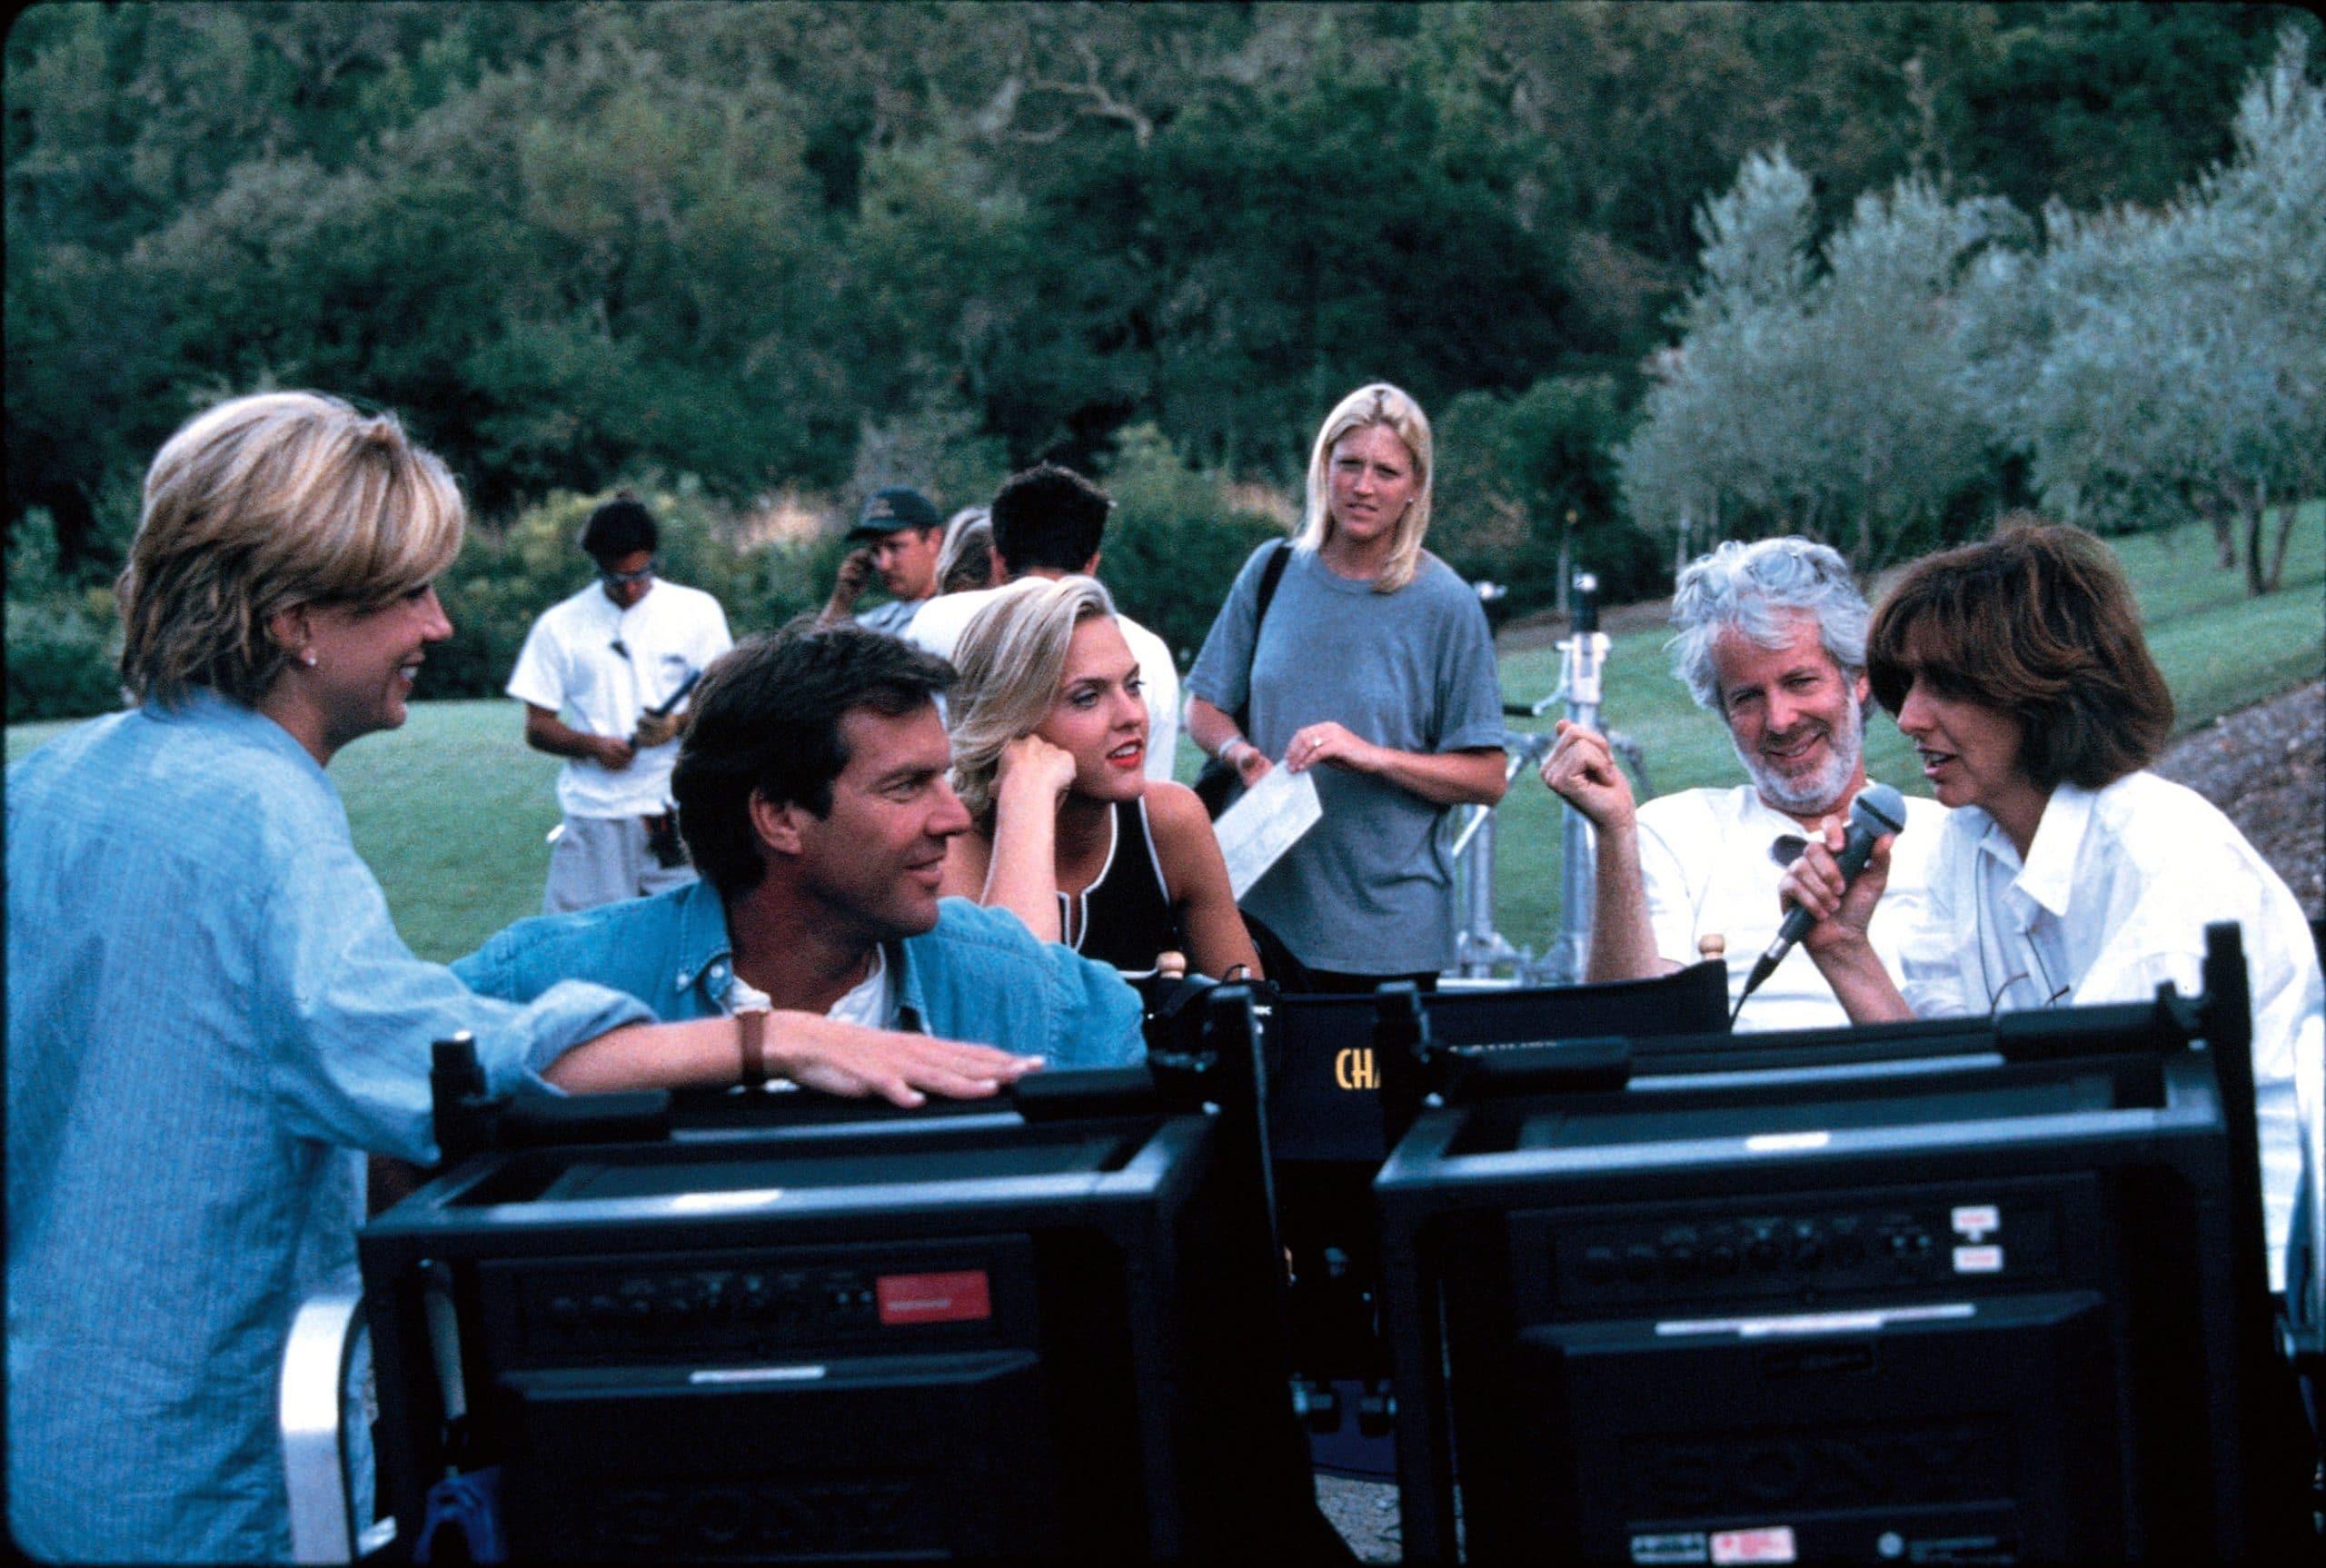 THE PARENT TRAP, Natasha Richardson, Dennis Quaid, Elaine Hendrix, screenwriter Charles Shyer, director Nancy Meyers on set, 1998